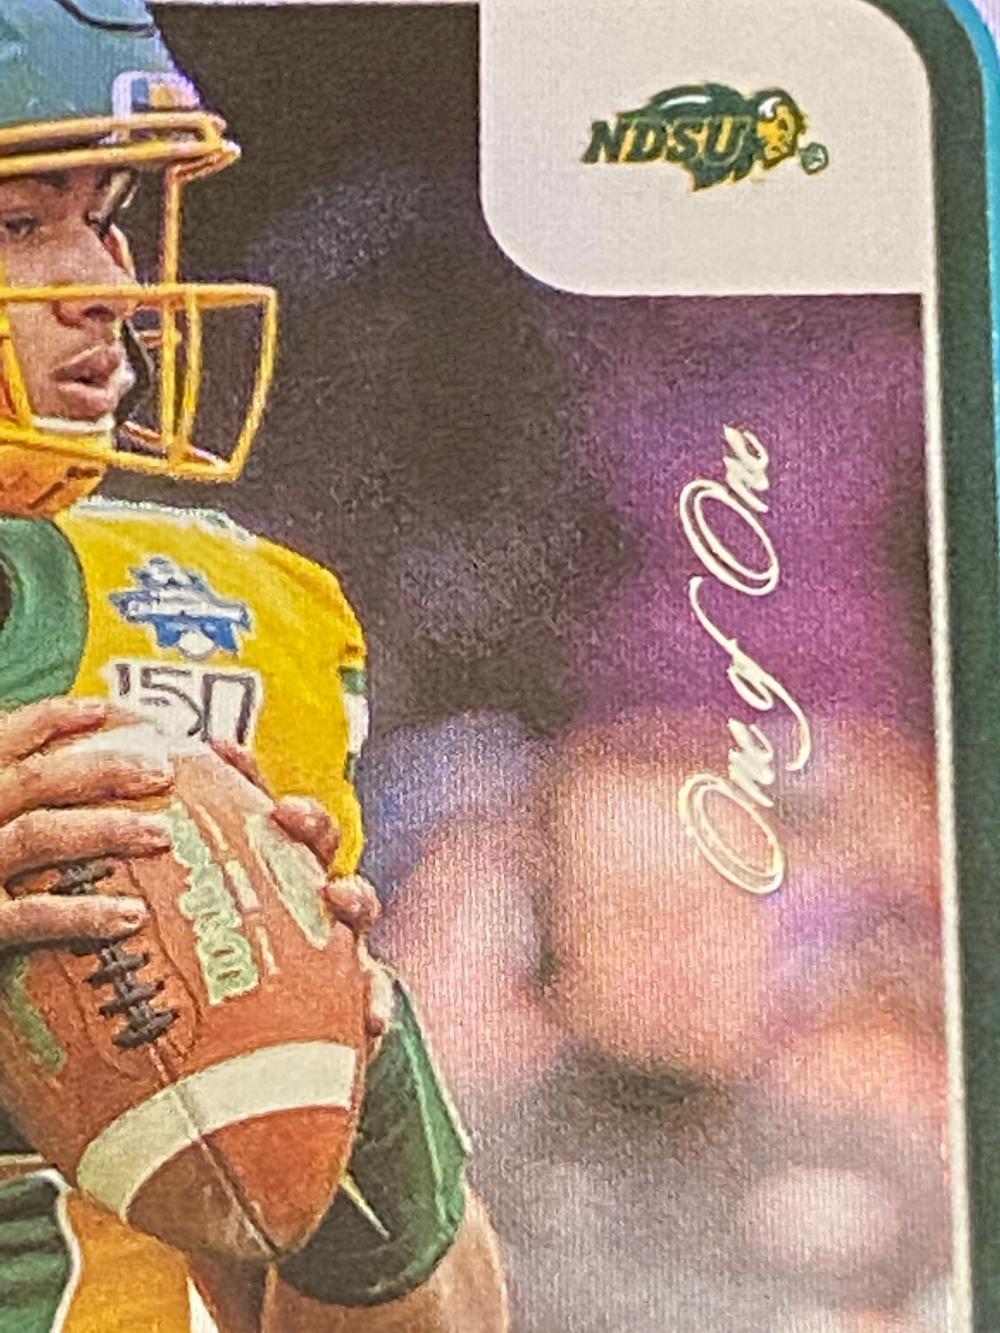 (1/1) 2021 Panini Contenders Draft Picks RC Auto Draft Ticket Trey Lance Rookie #203 Football Card - Numbered /1